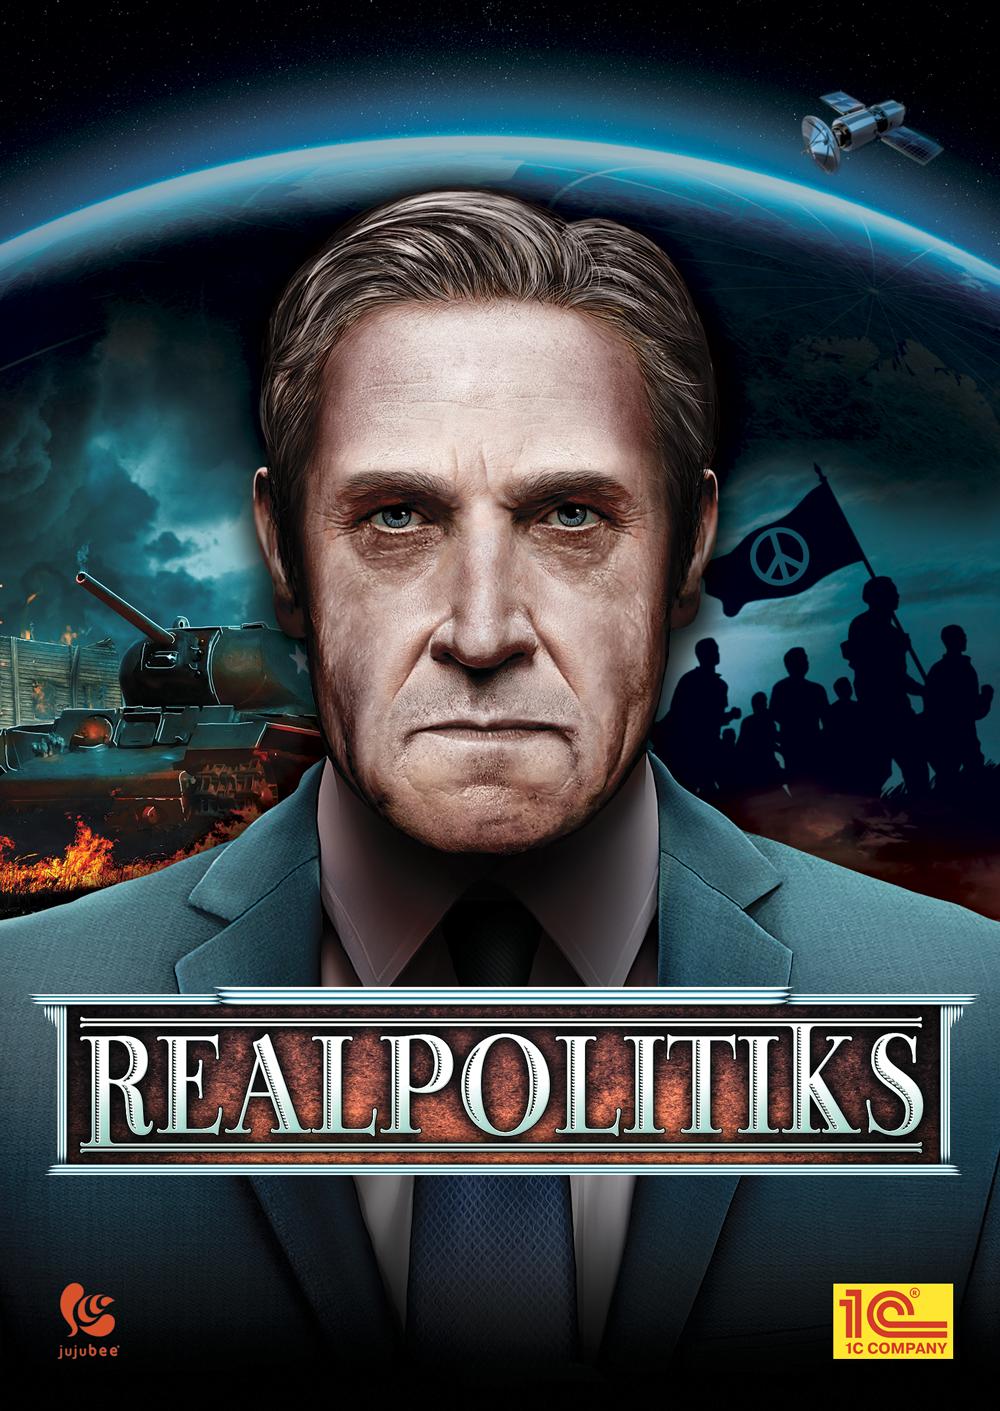 Realpolitiks [Online Game - Your Shape Face Determine